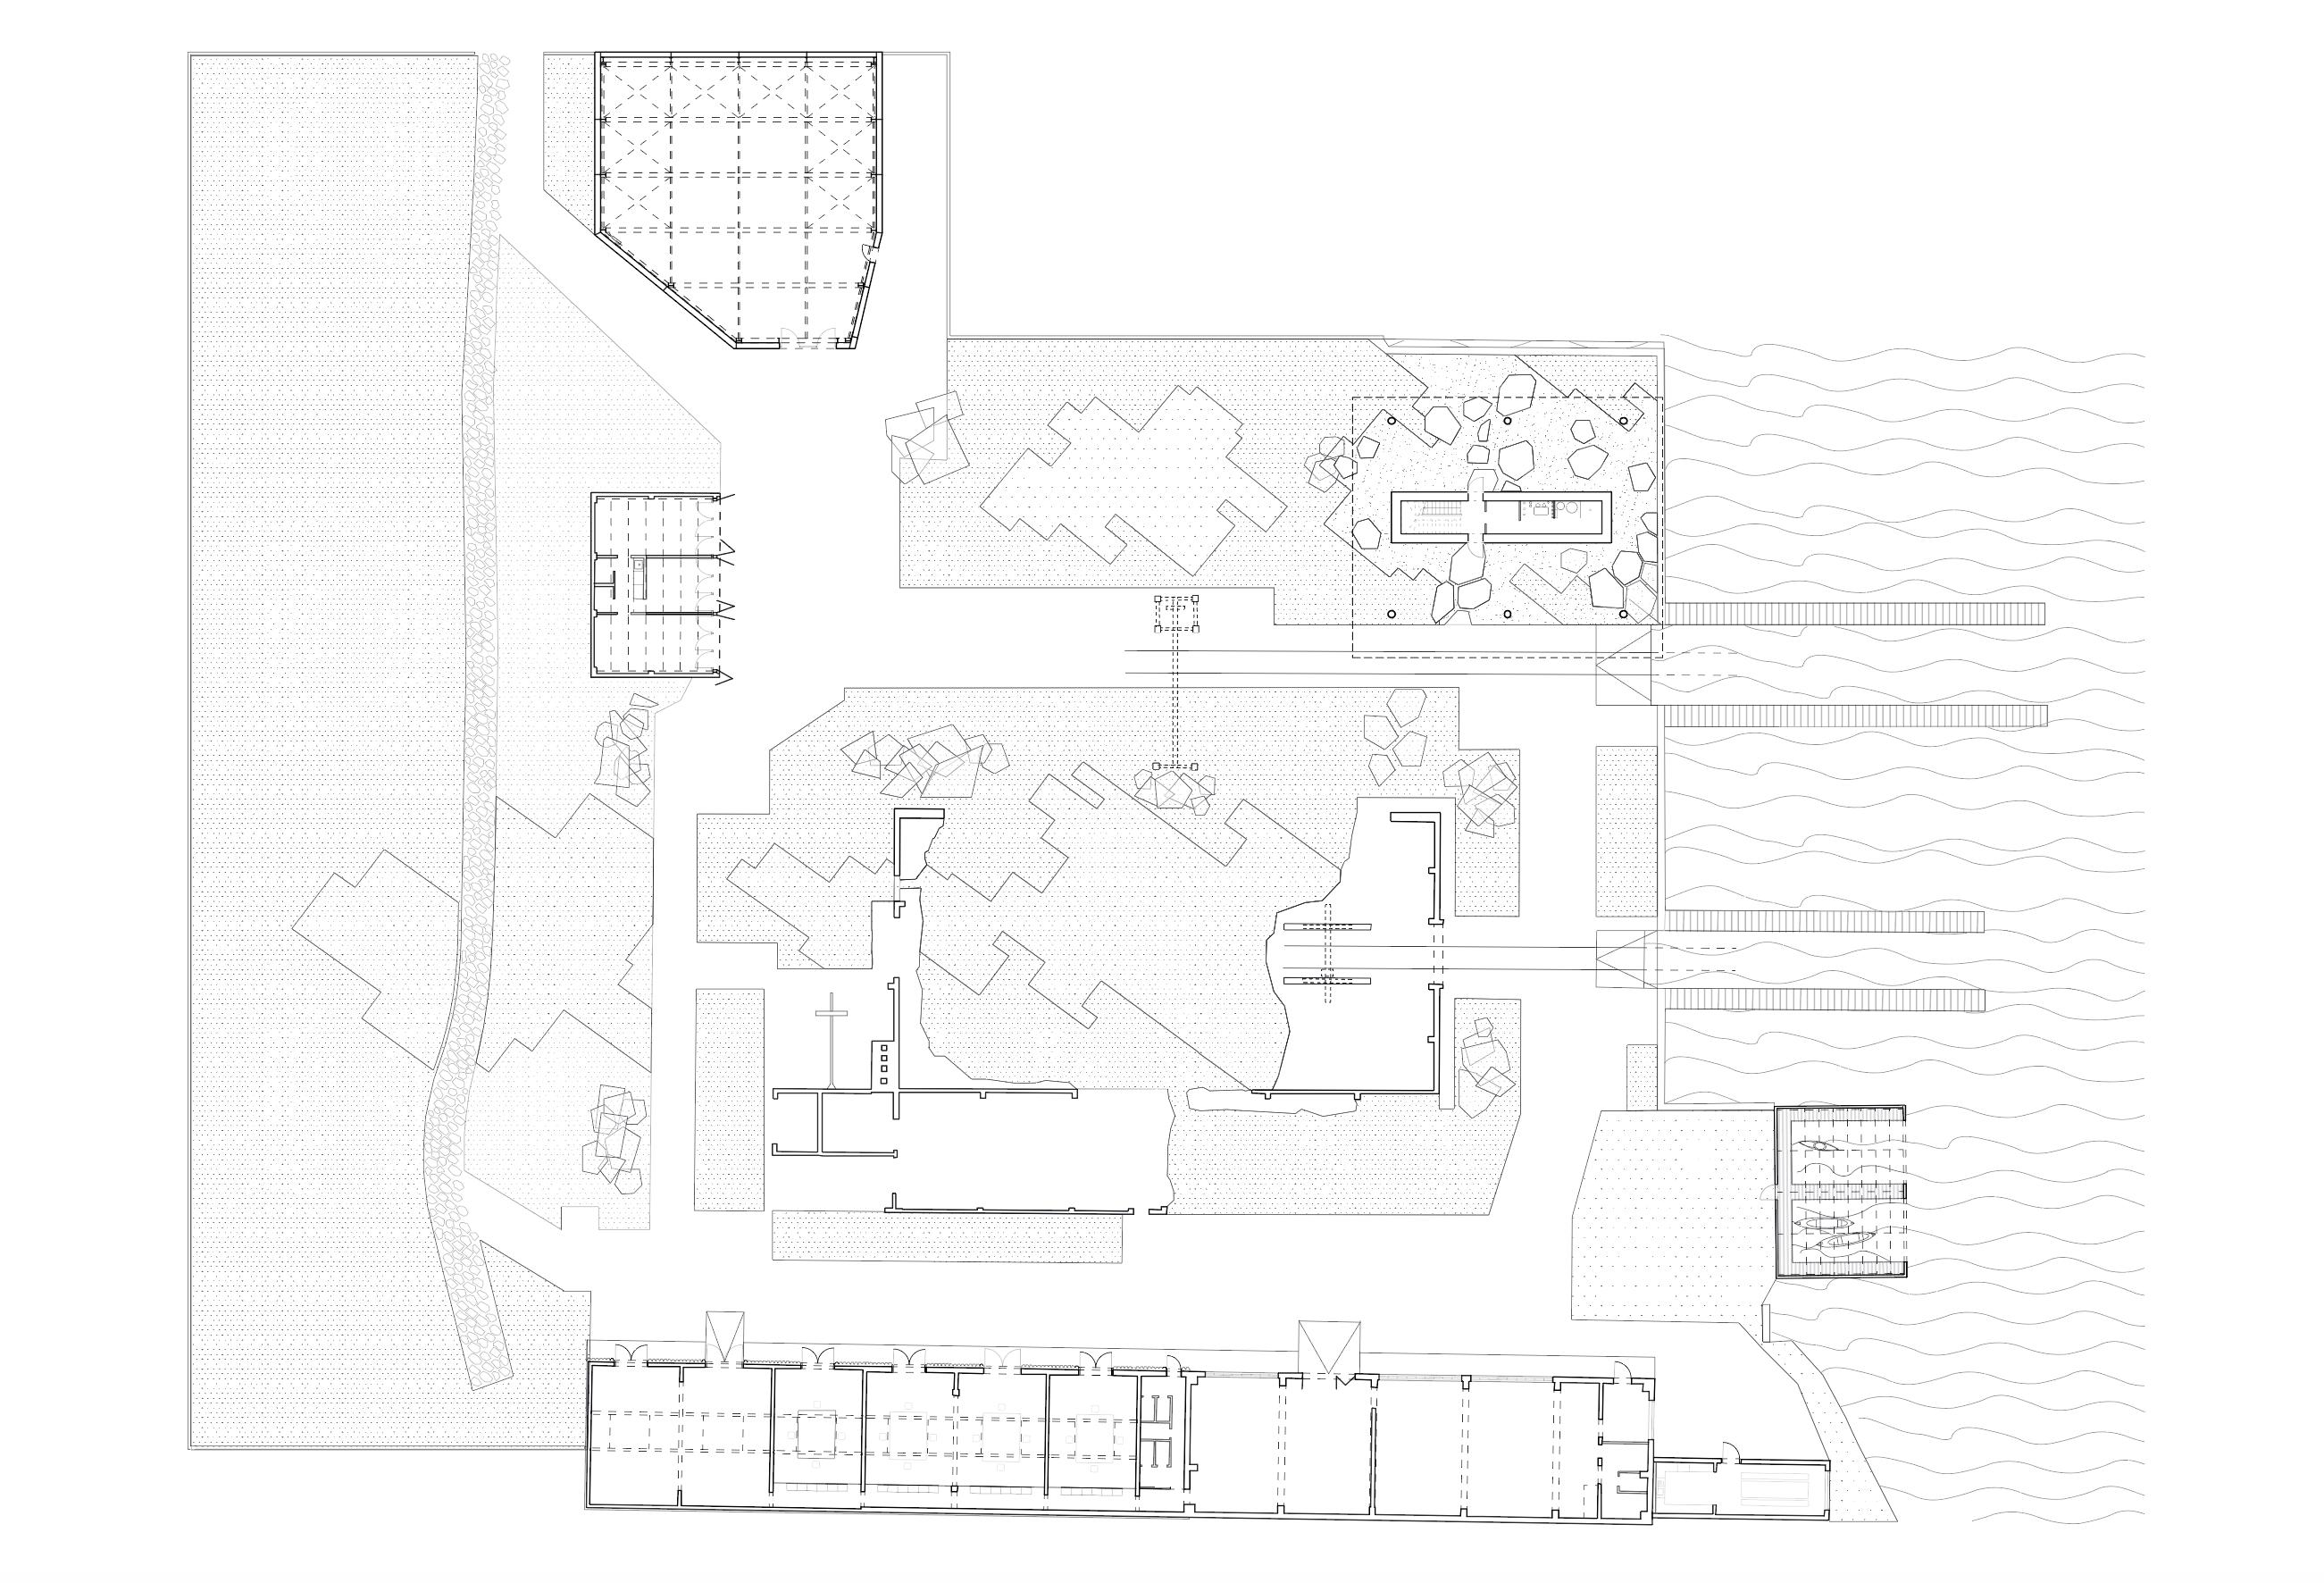 Ruinengarten Lageplan Tanja Lincke Architekten